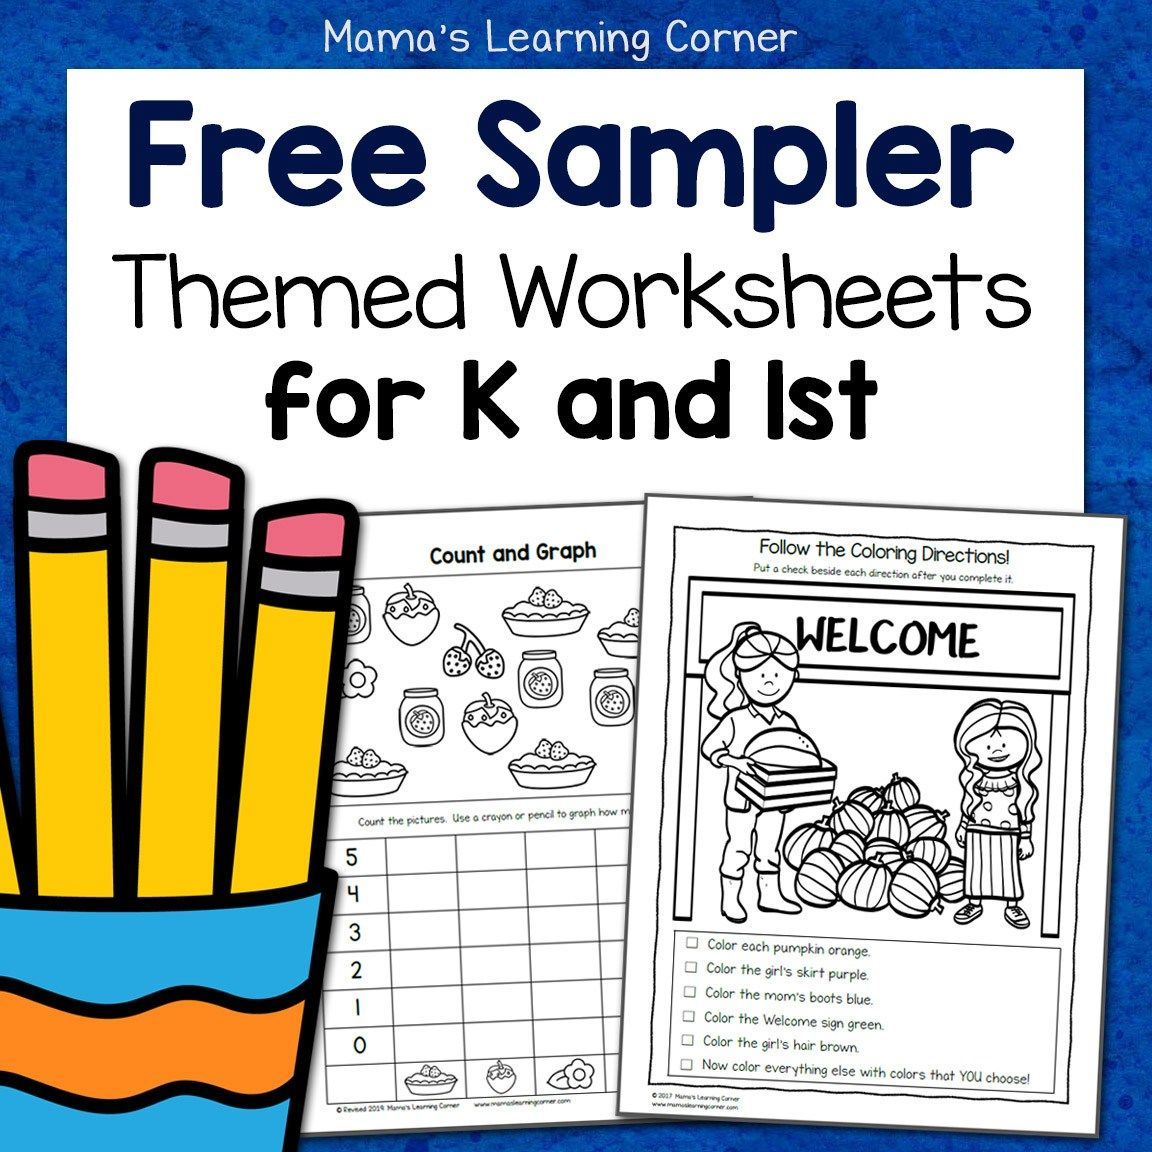 Free Kindergarten And First Grade Worksheet Sampler Packet First Grade Worksheets Kindergarten Worksheets Kindergarten Worksheets Printable [ 1152 x 1152 Pixel ]